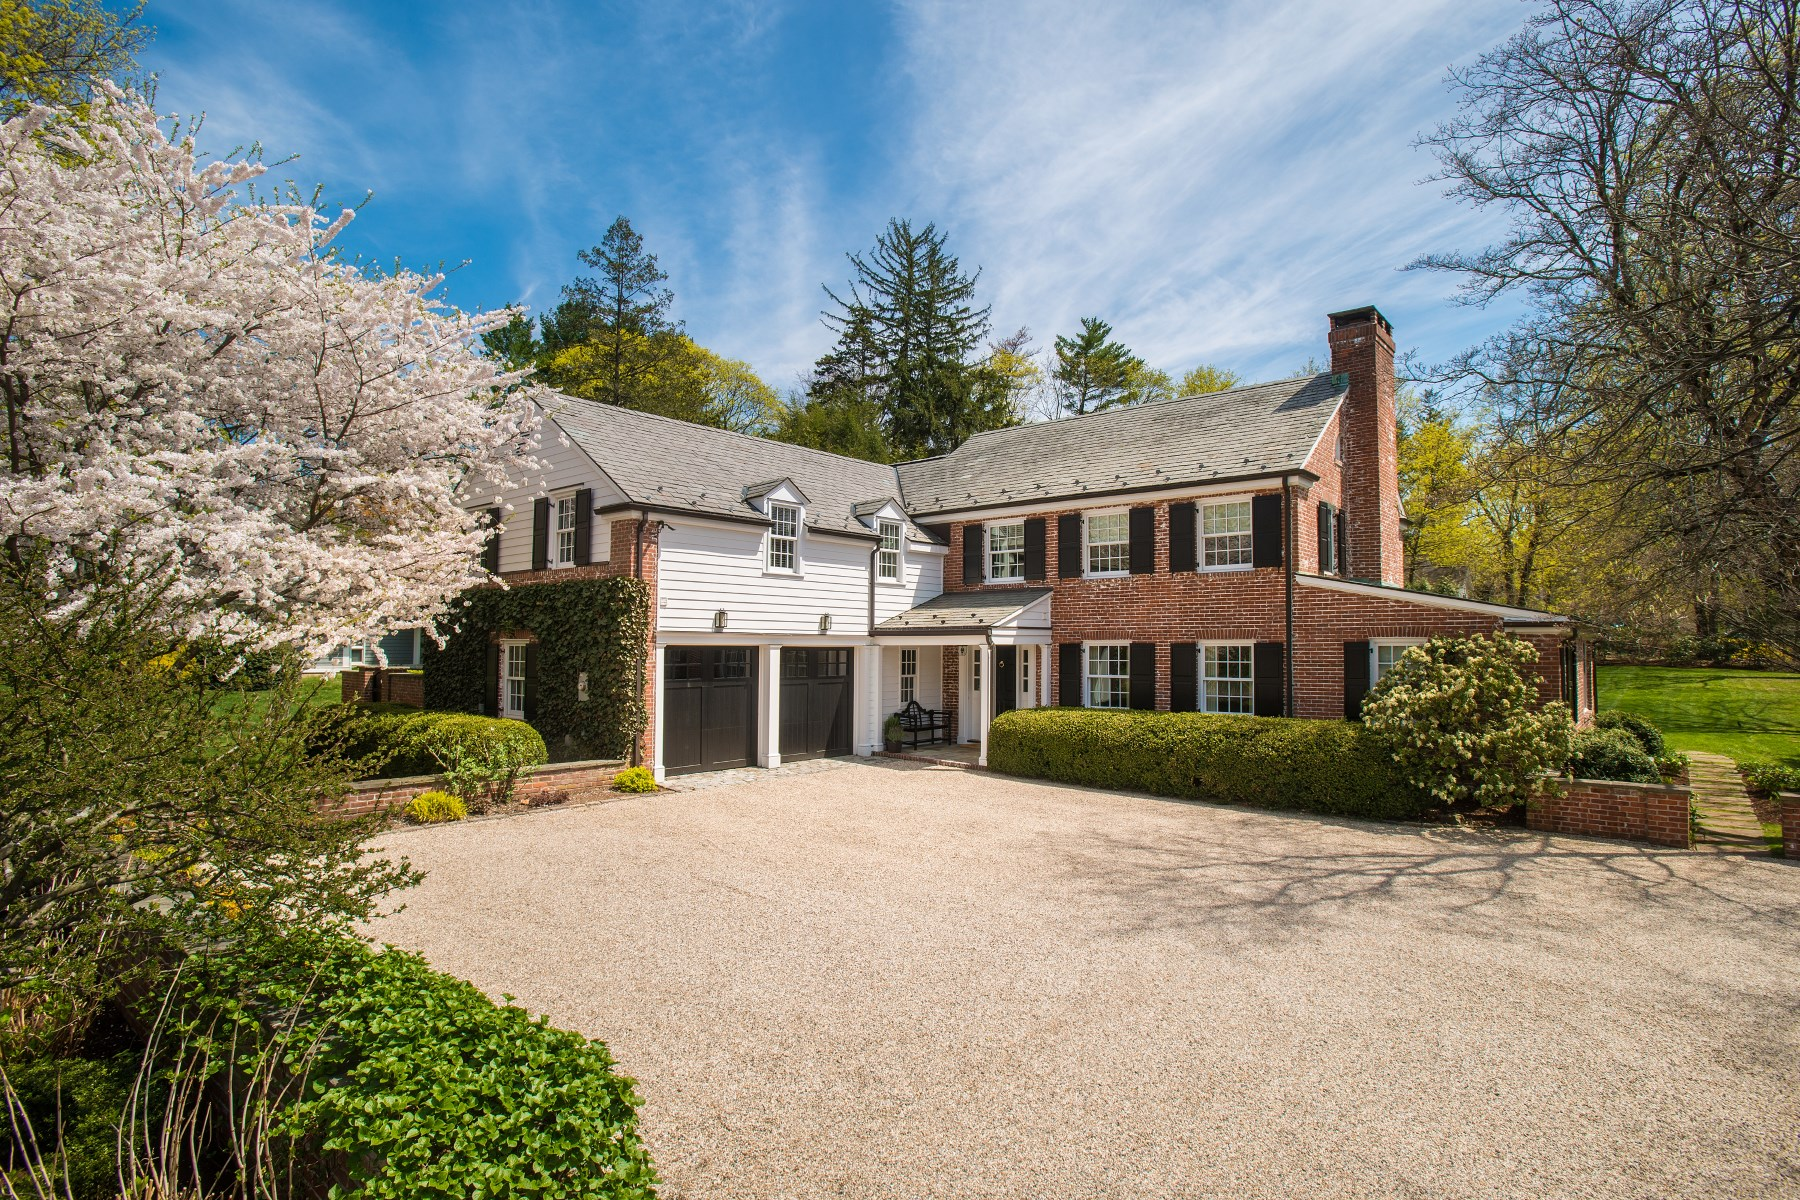 Tek Ailelik Ev için Satış at Patterson Avenue Classic 27 Patterson Avenue Central Greenwich, Greenwich, Connecticut 06830 Amerika Birleşik Devletleri